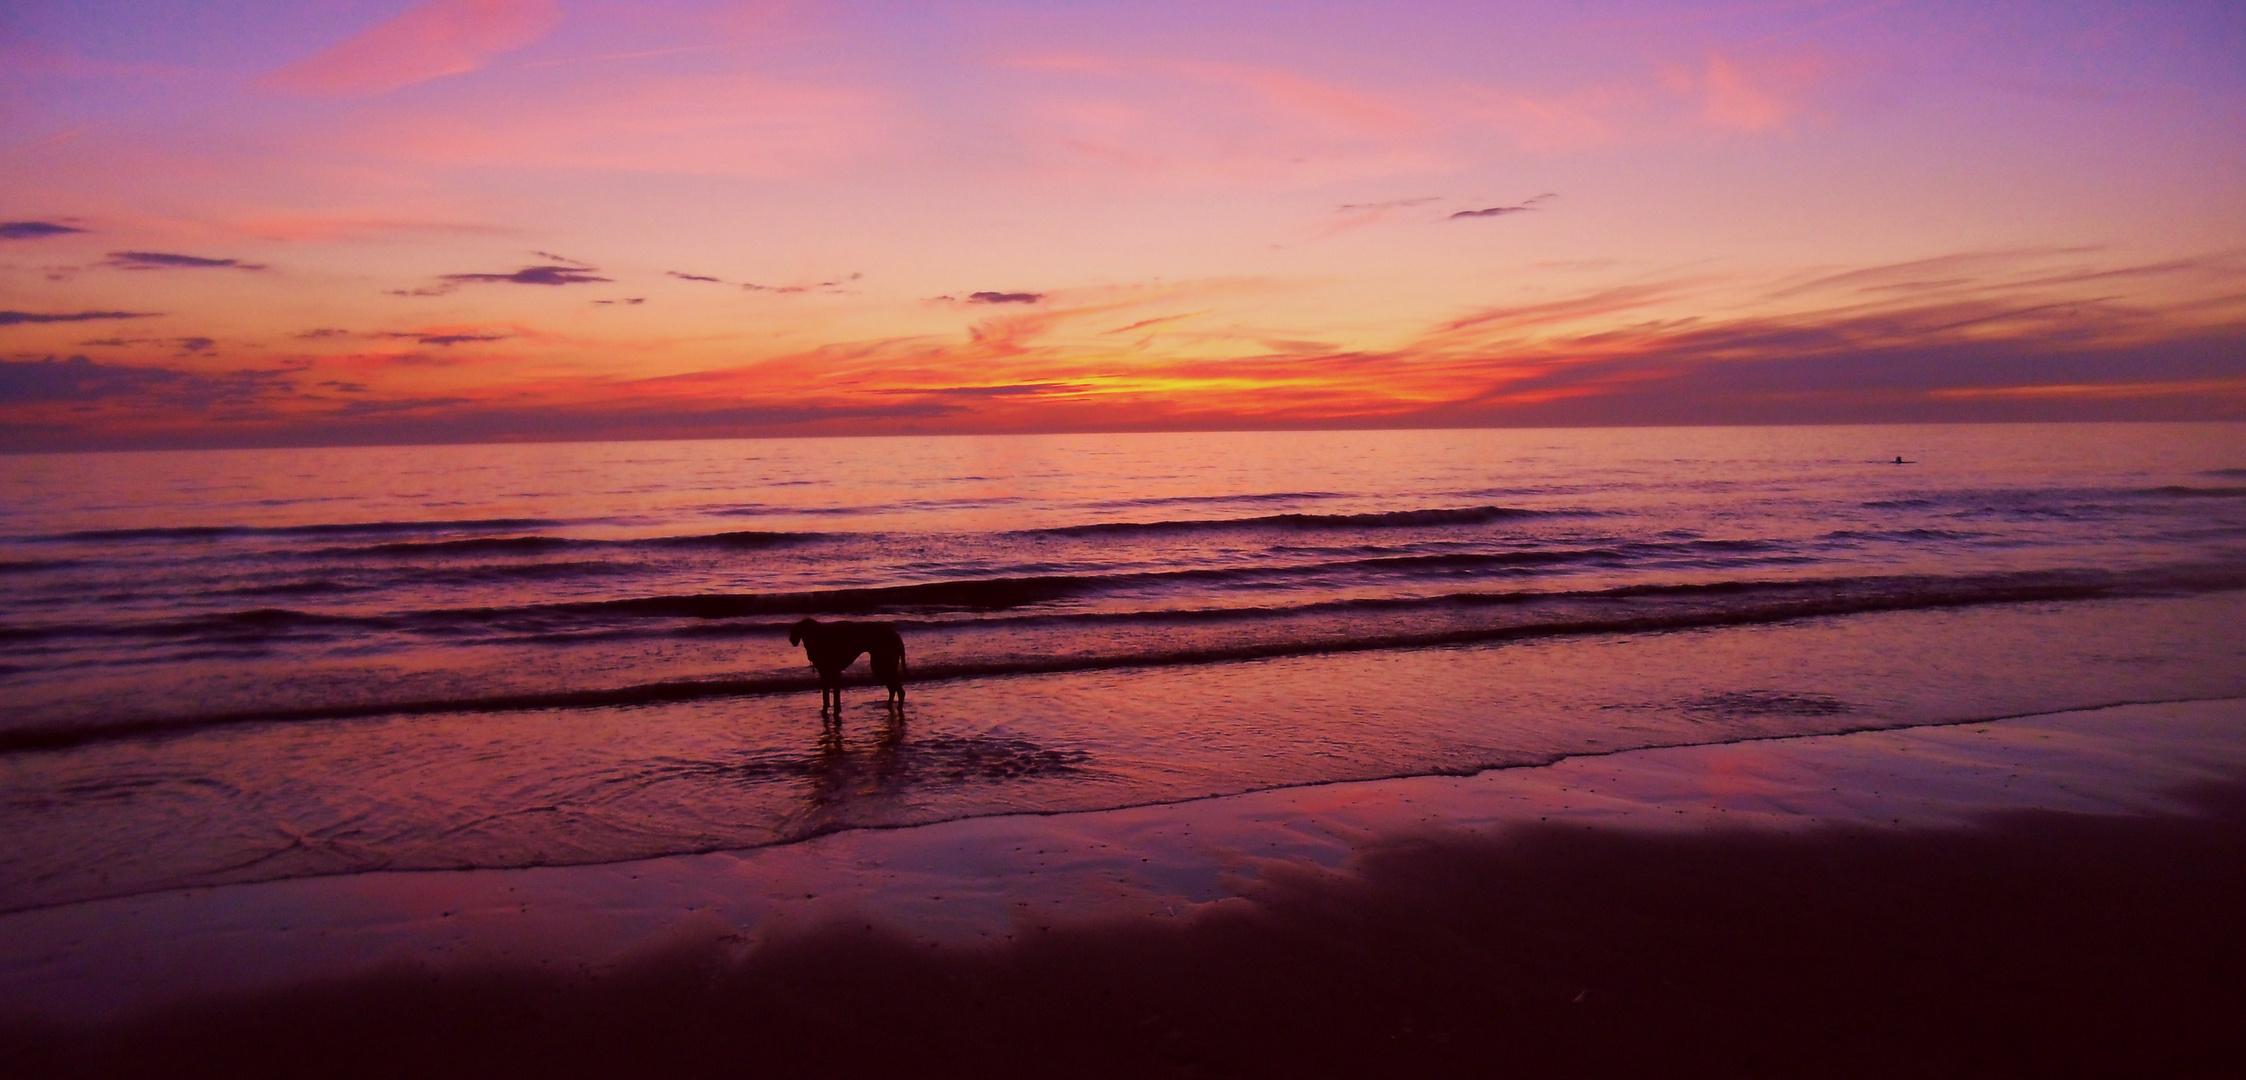 Sonnenuntergang in Zandvoort